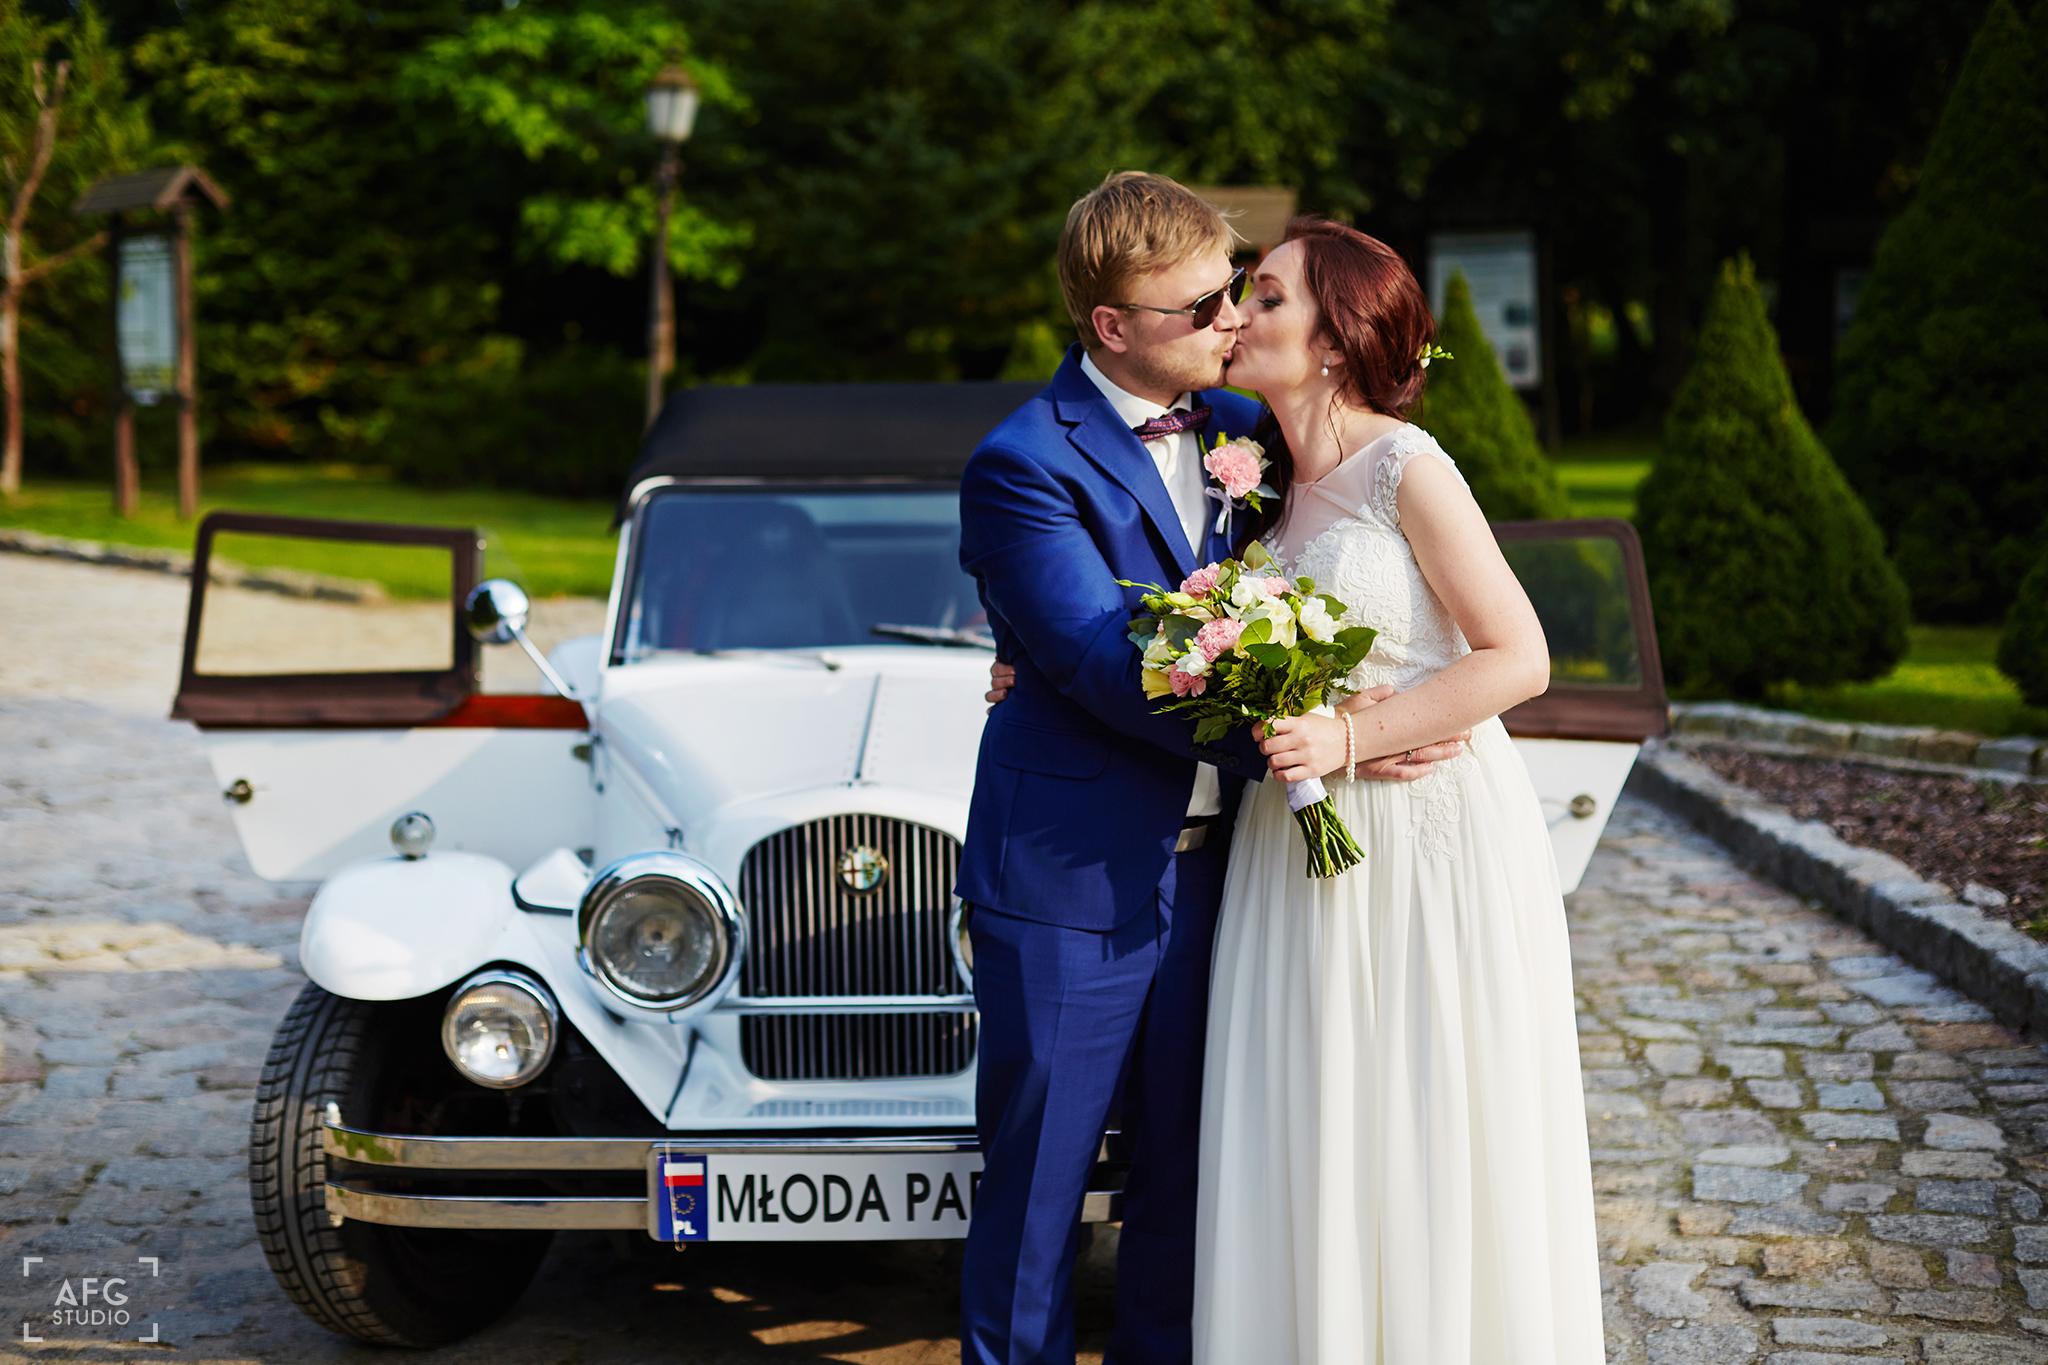 pocałunek, samochód ślubny, para młoda